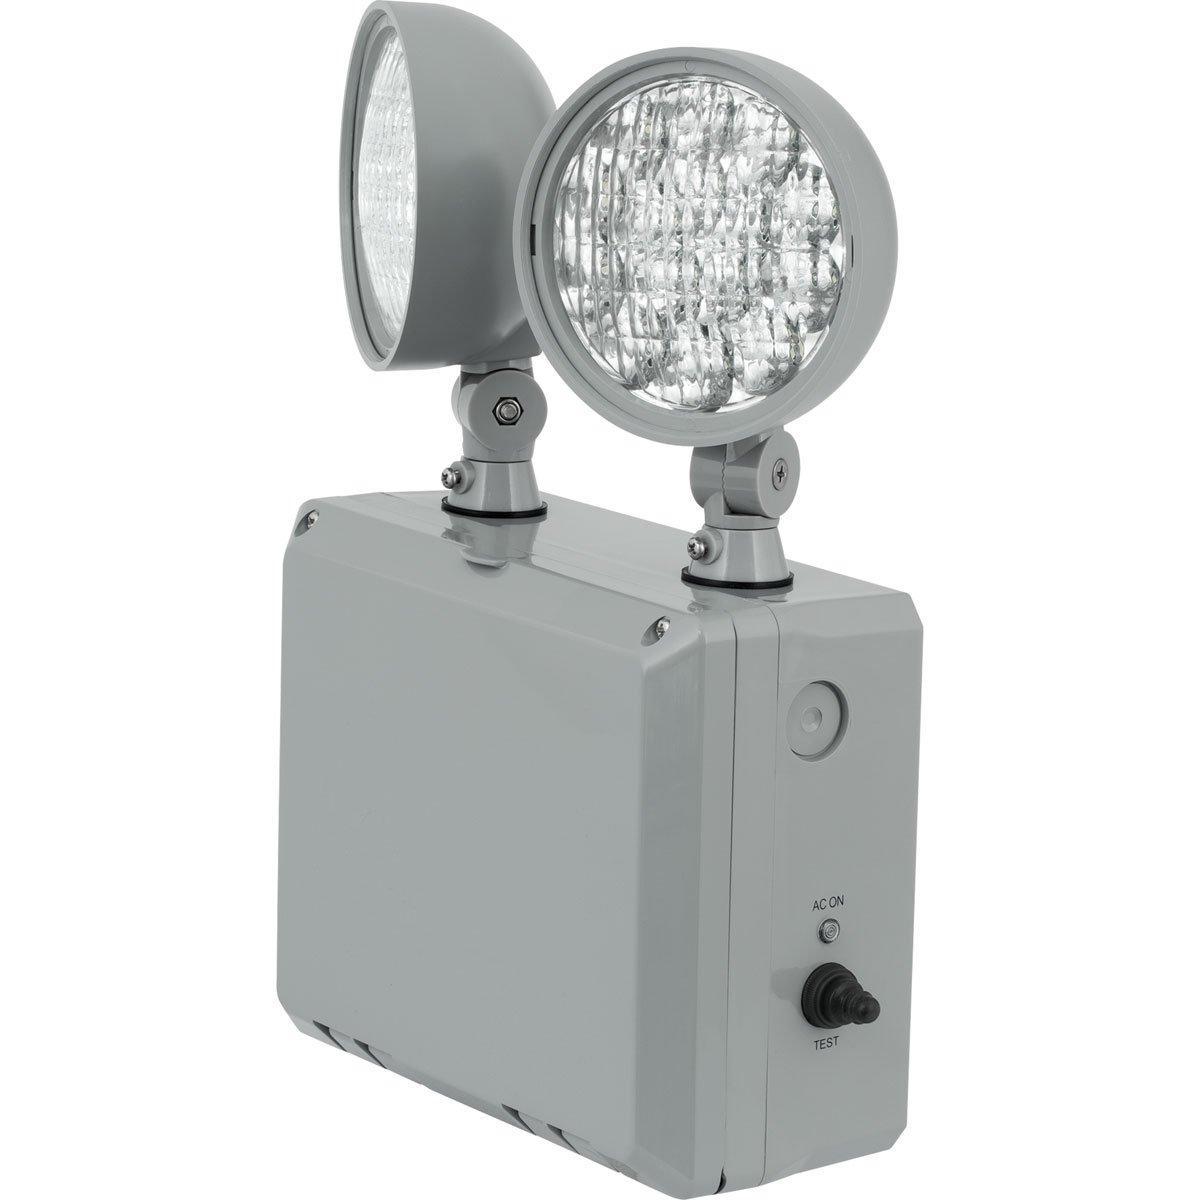 Progress Commercial PE2WL-82 LED Emergency Unit, Gray by Progress Commercial (Image #1)